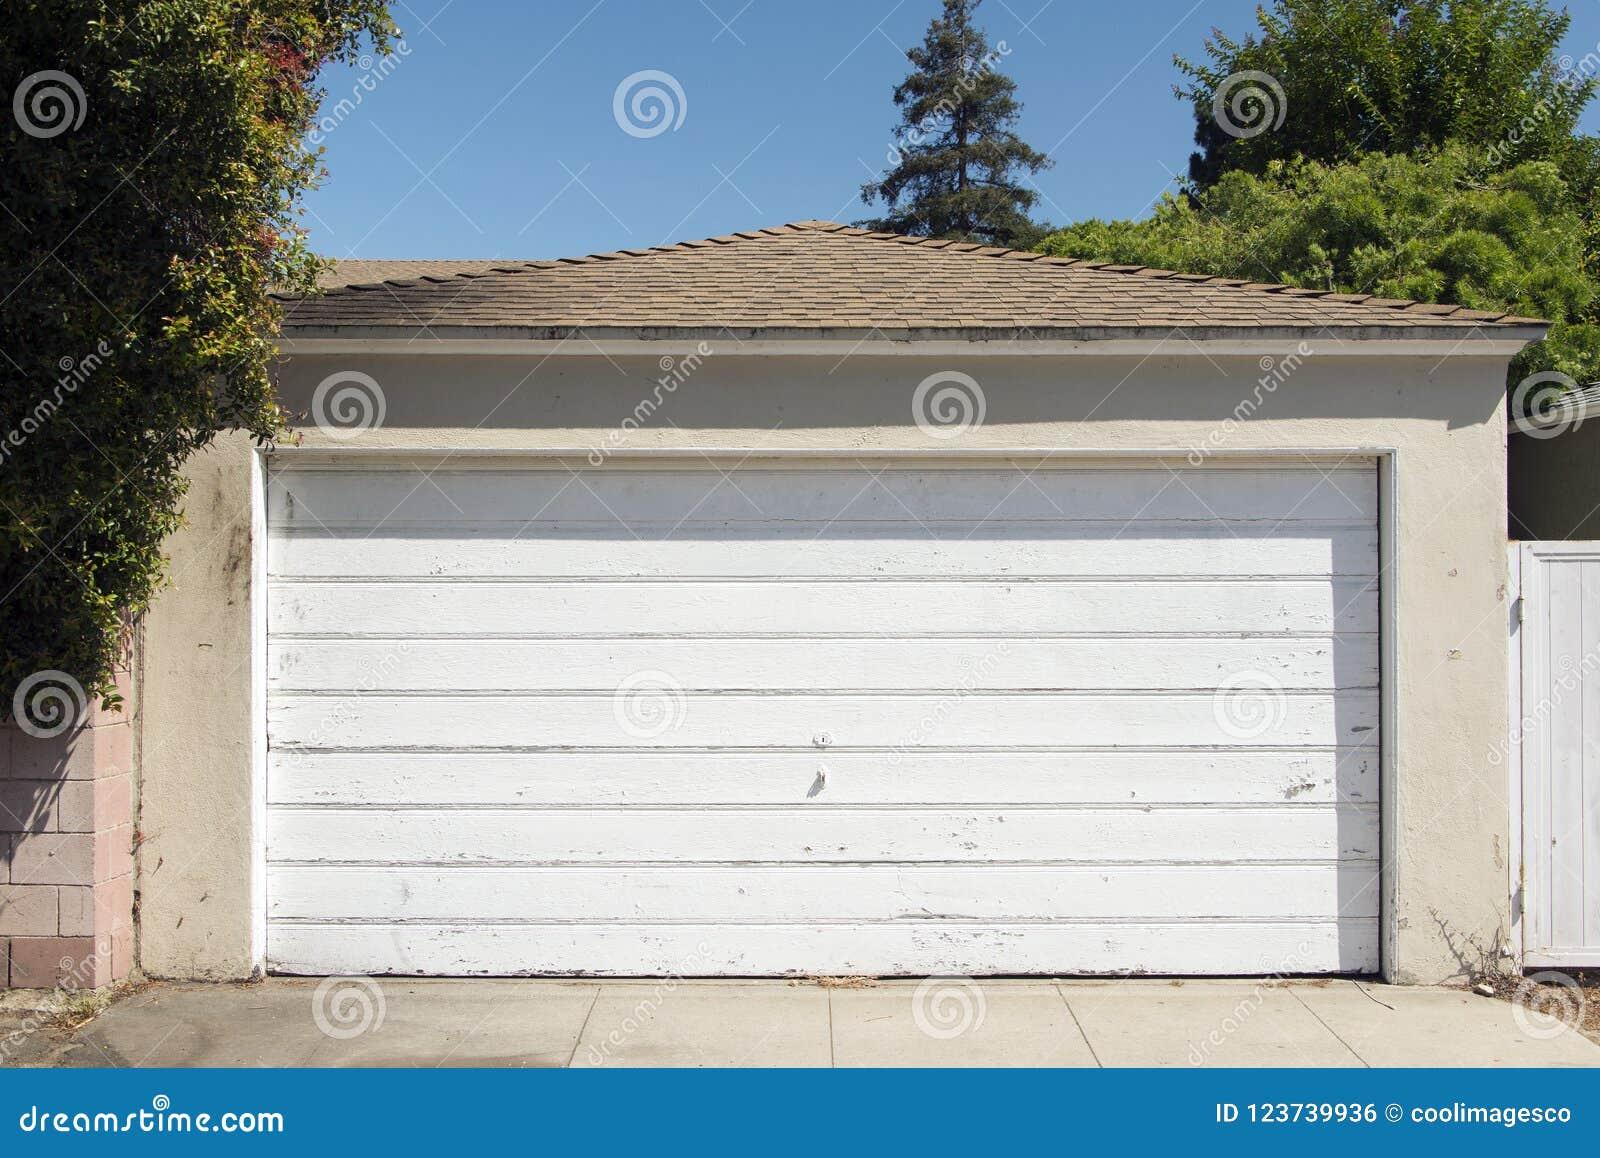 A View Of A Wooden Garage Door In Santa Monica California Stock